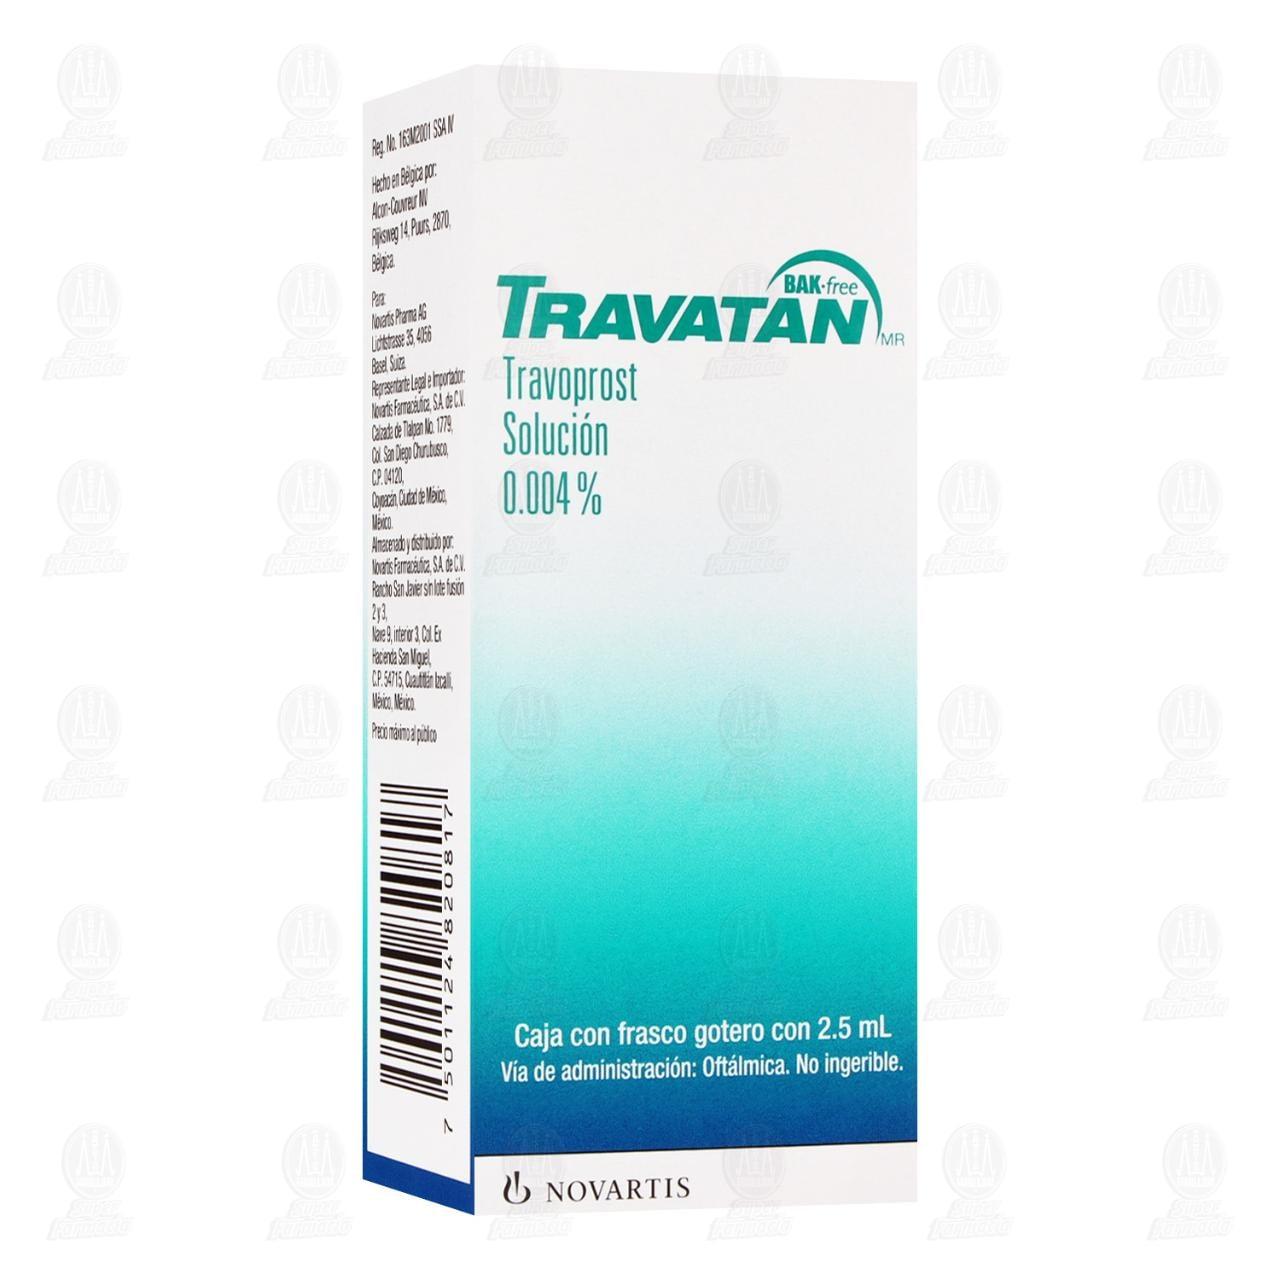 Comprar Travatan 0.004% 2.5ml Solución Oftálmica en Farmacias Guadalajara